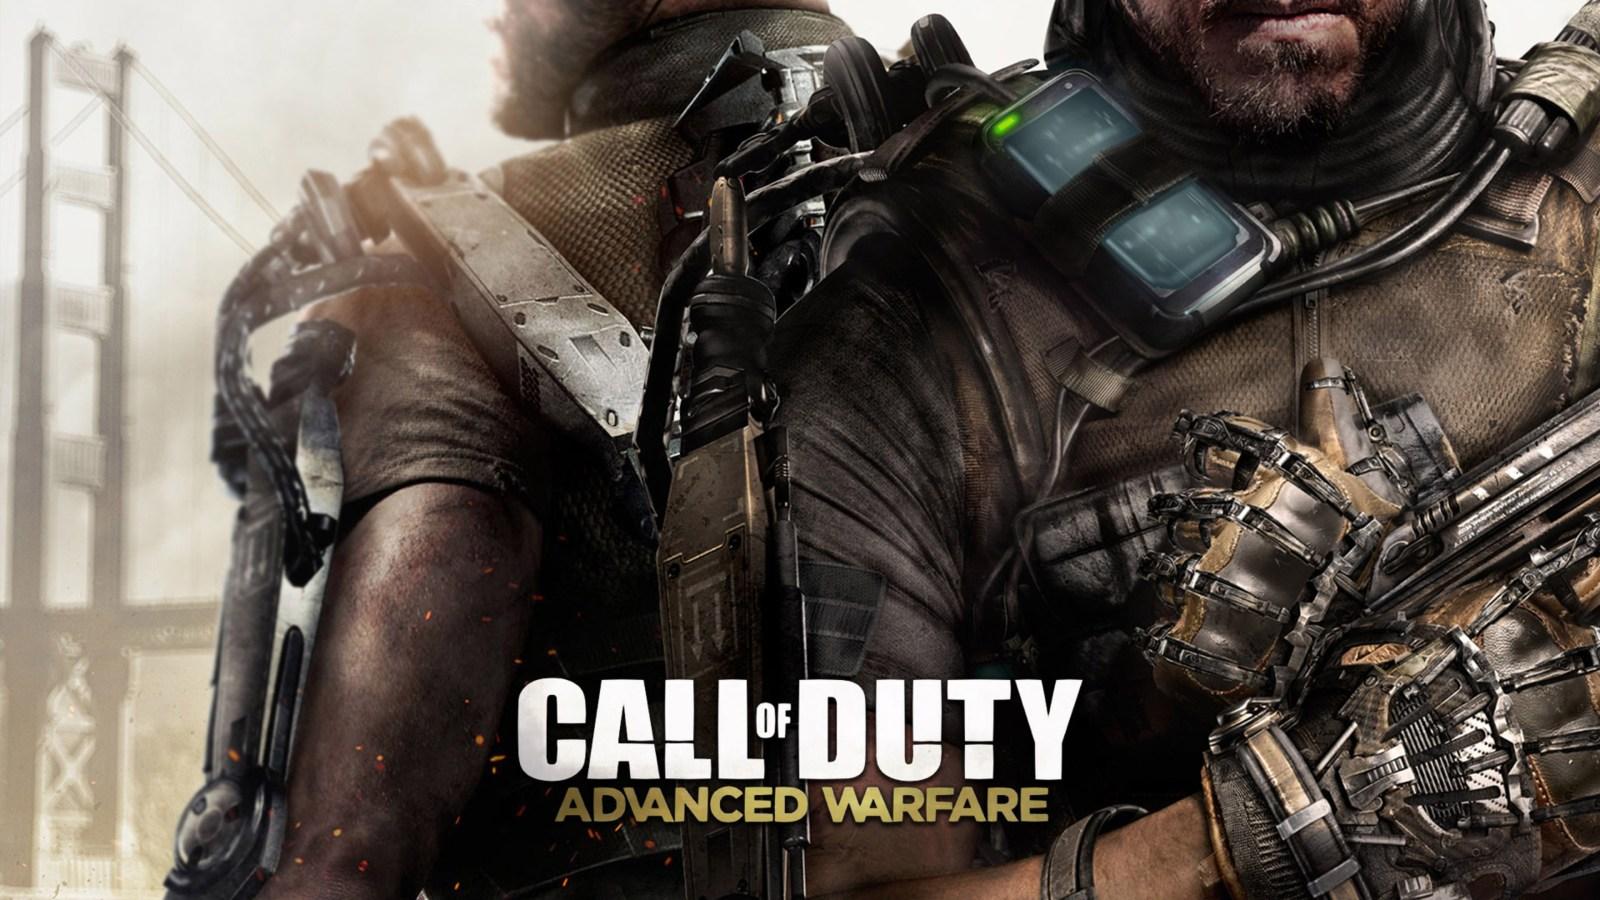 Games/Apps: Call of Duty Advanced Warfare $30, Skylanders holiday bundle $64, iOS freebies, more